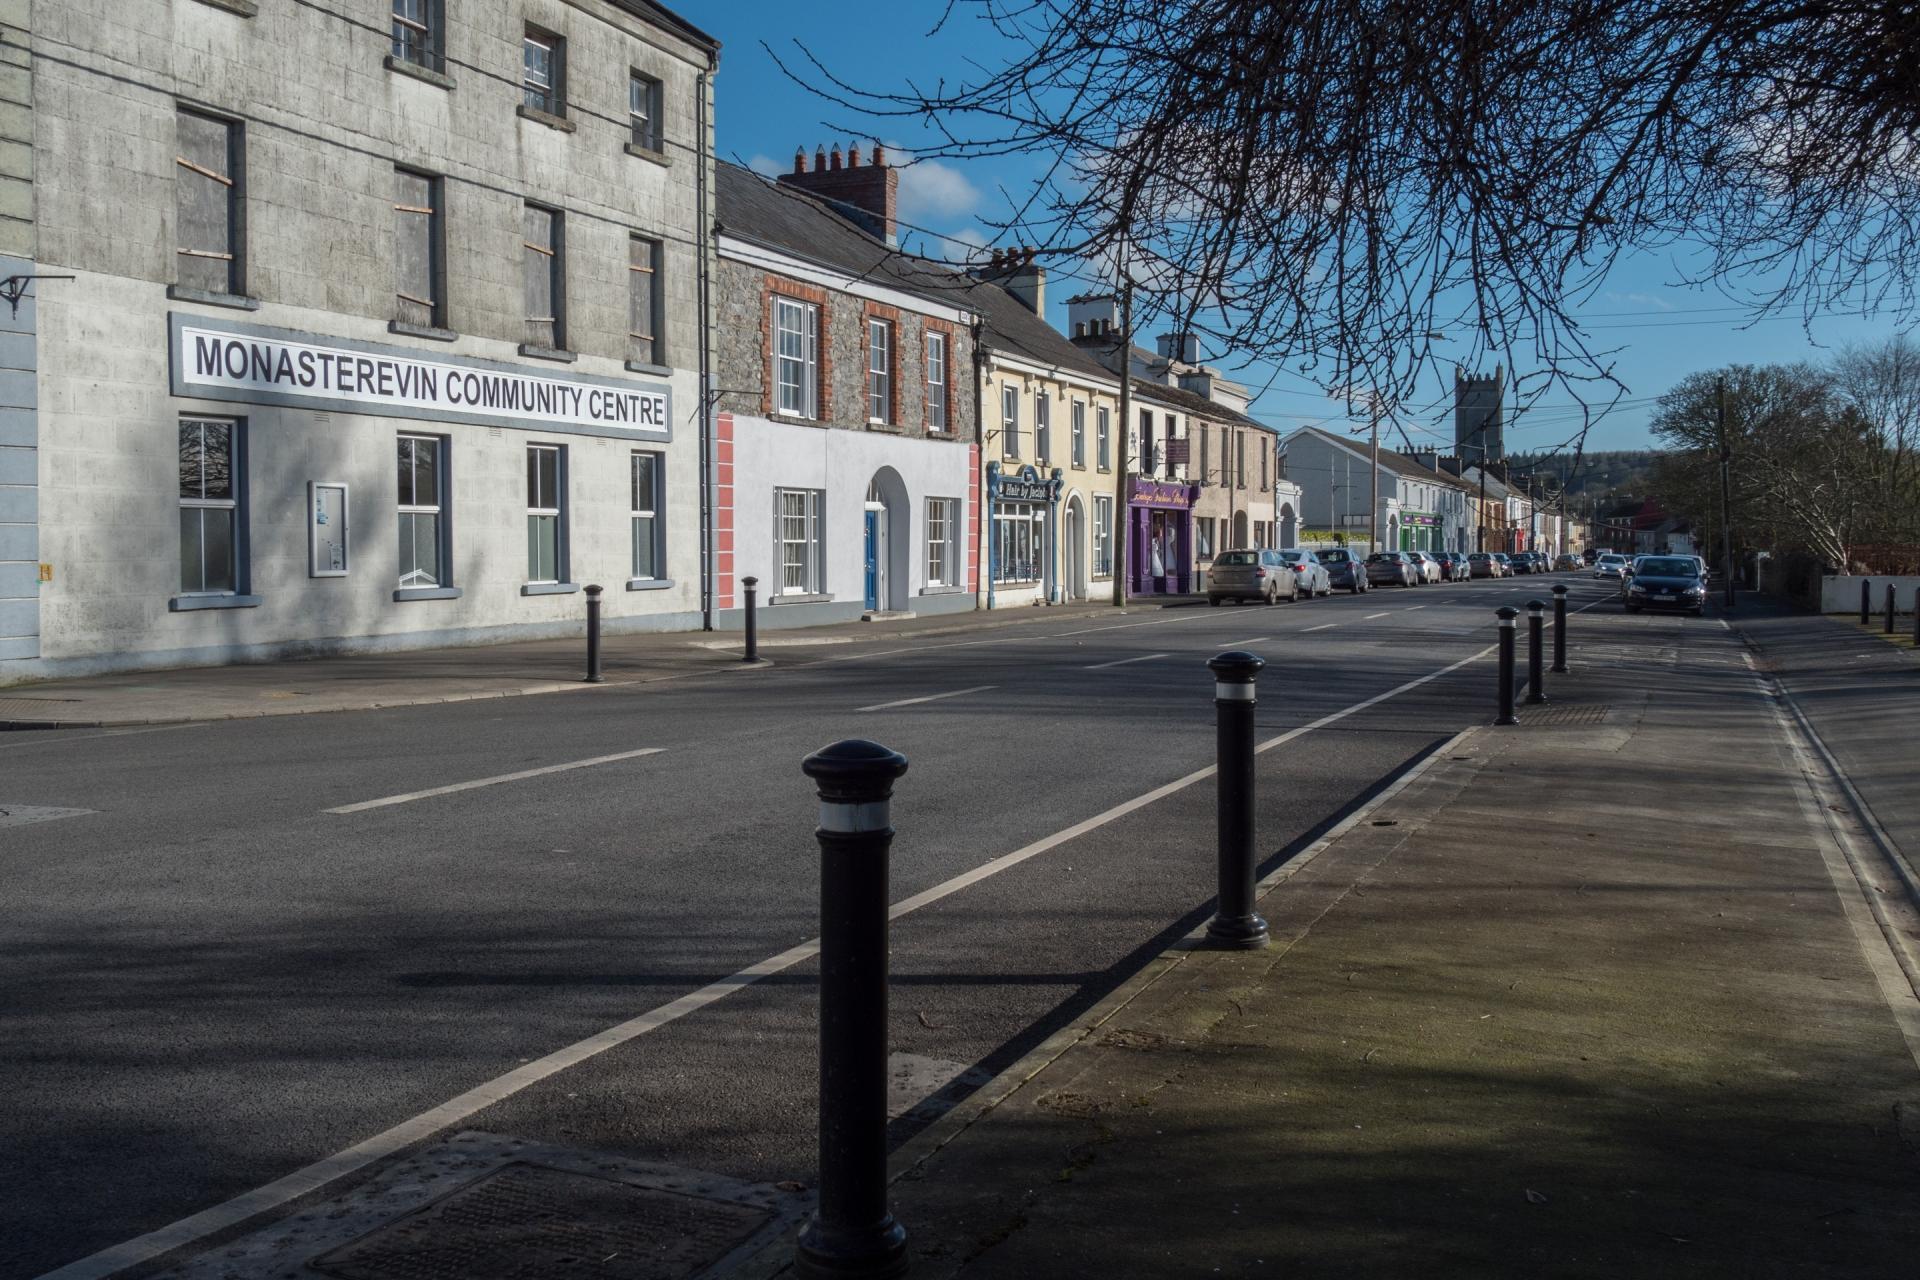 Monasterevin, Kildare Commercial property - tonyshirley.co.uk